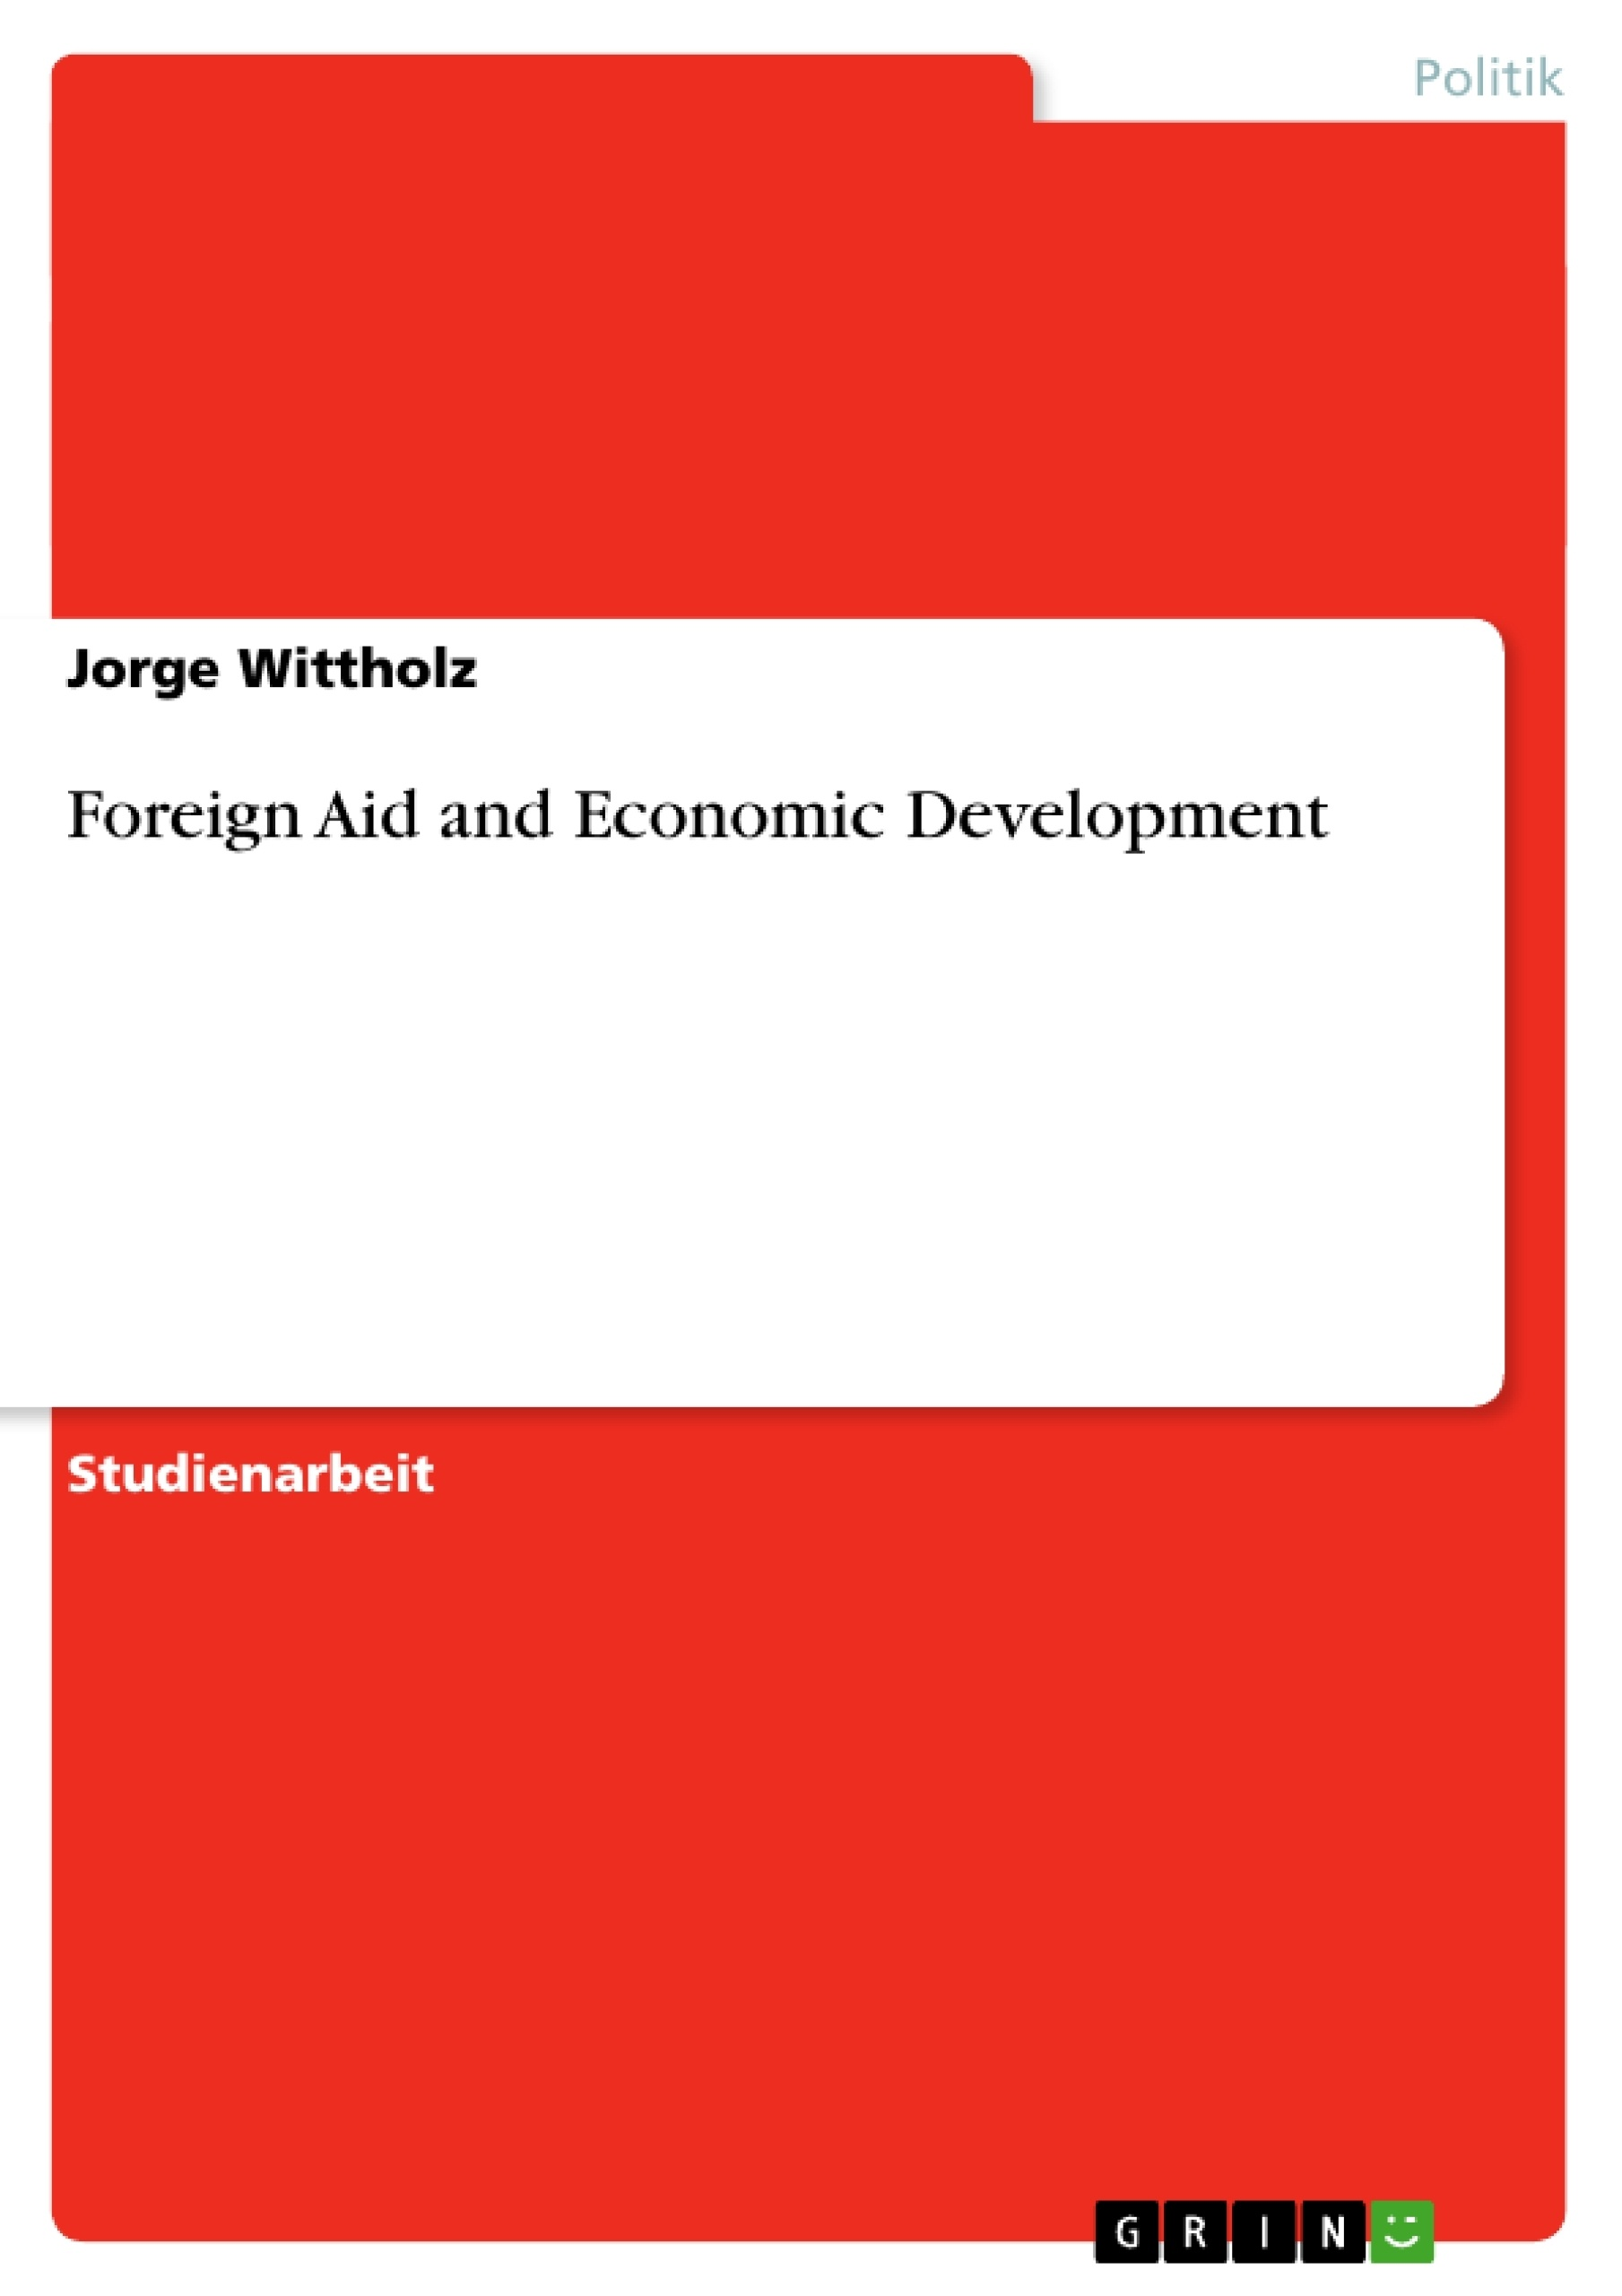 Titel: Foreign Aid and Economic Development